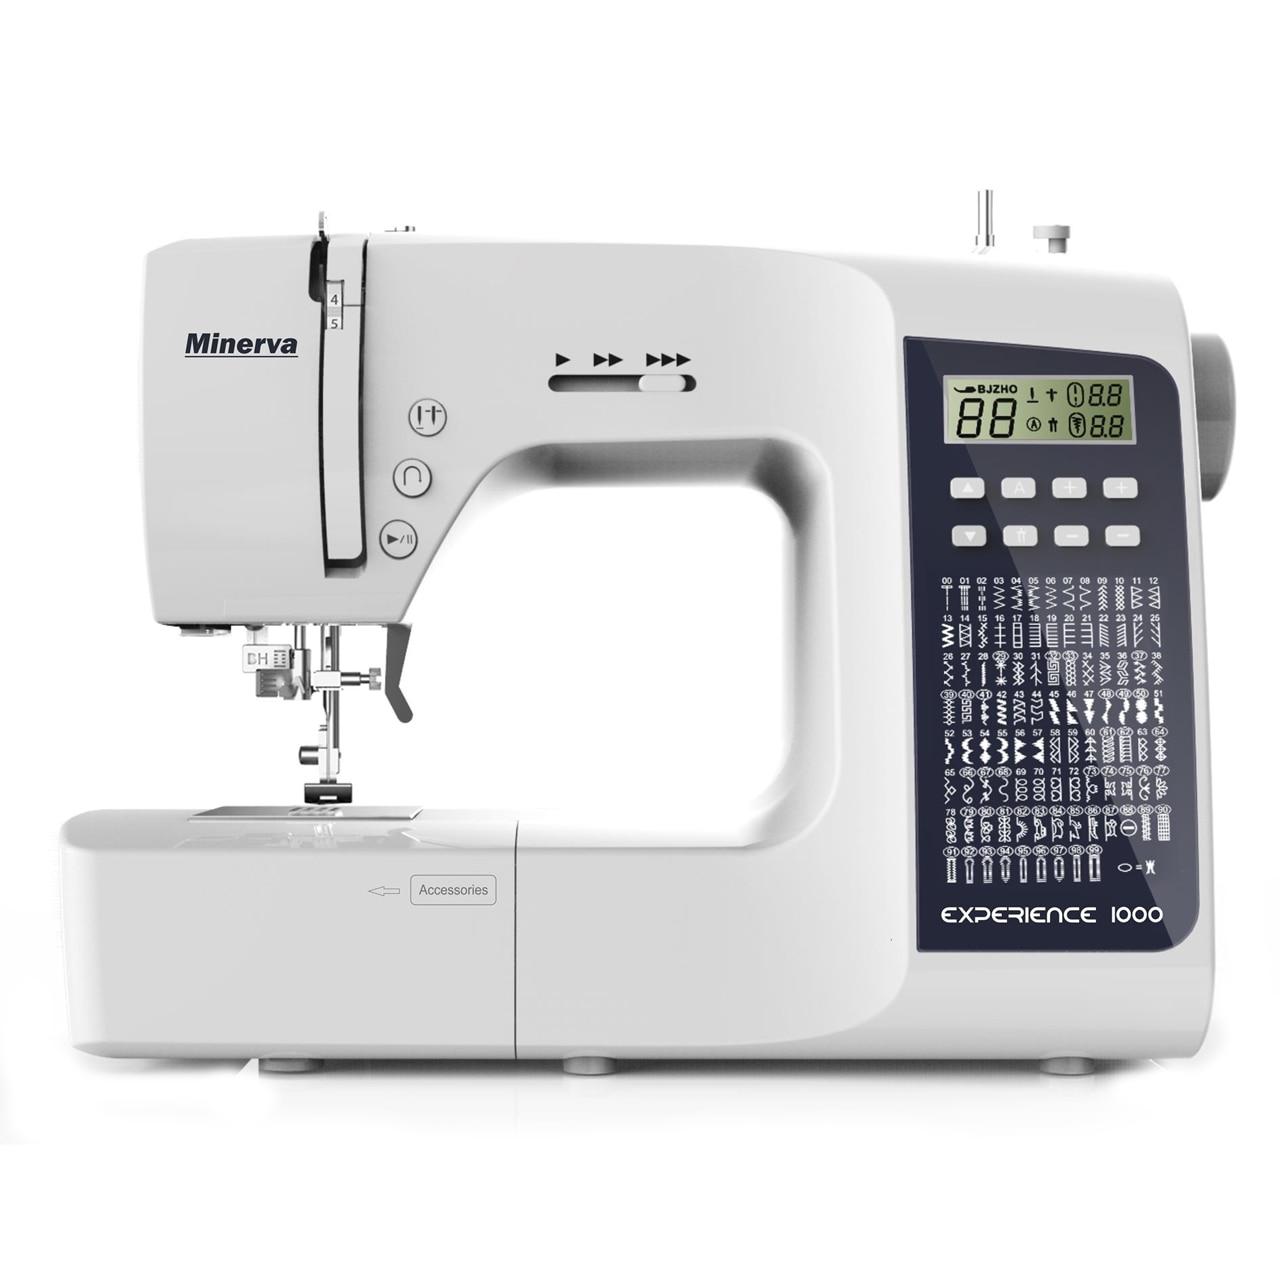 Sewing machine Minerva Experience 1000 (100, electronic, lighting, full set) sewing machine minerva indi 219i